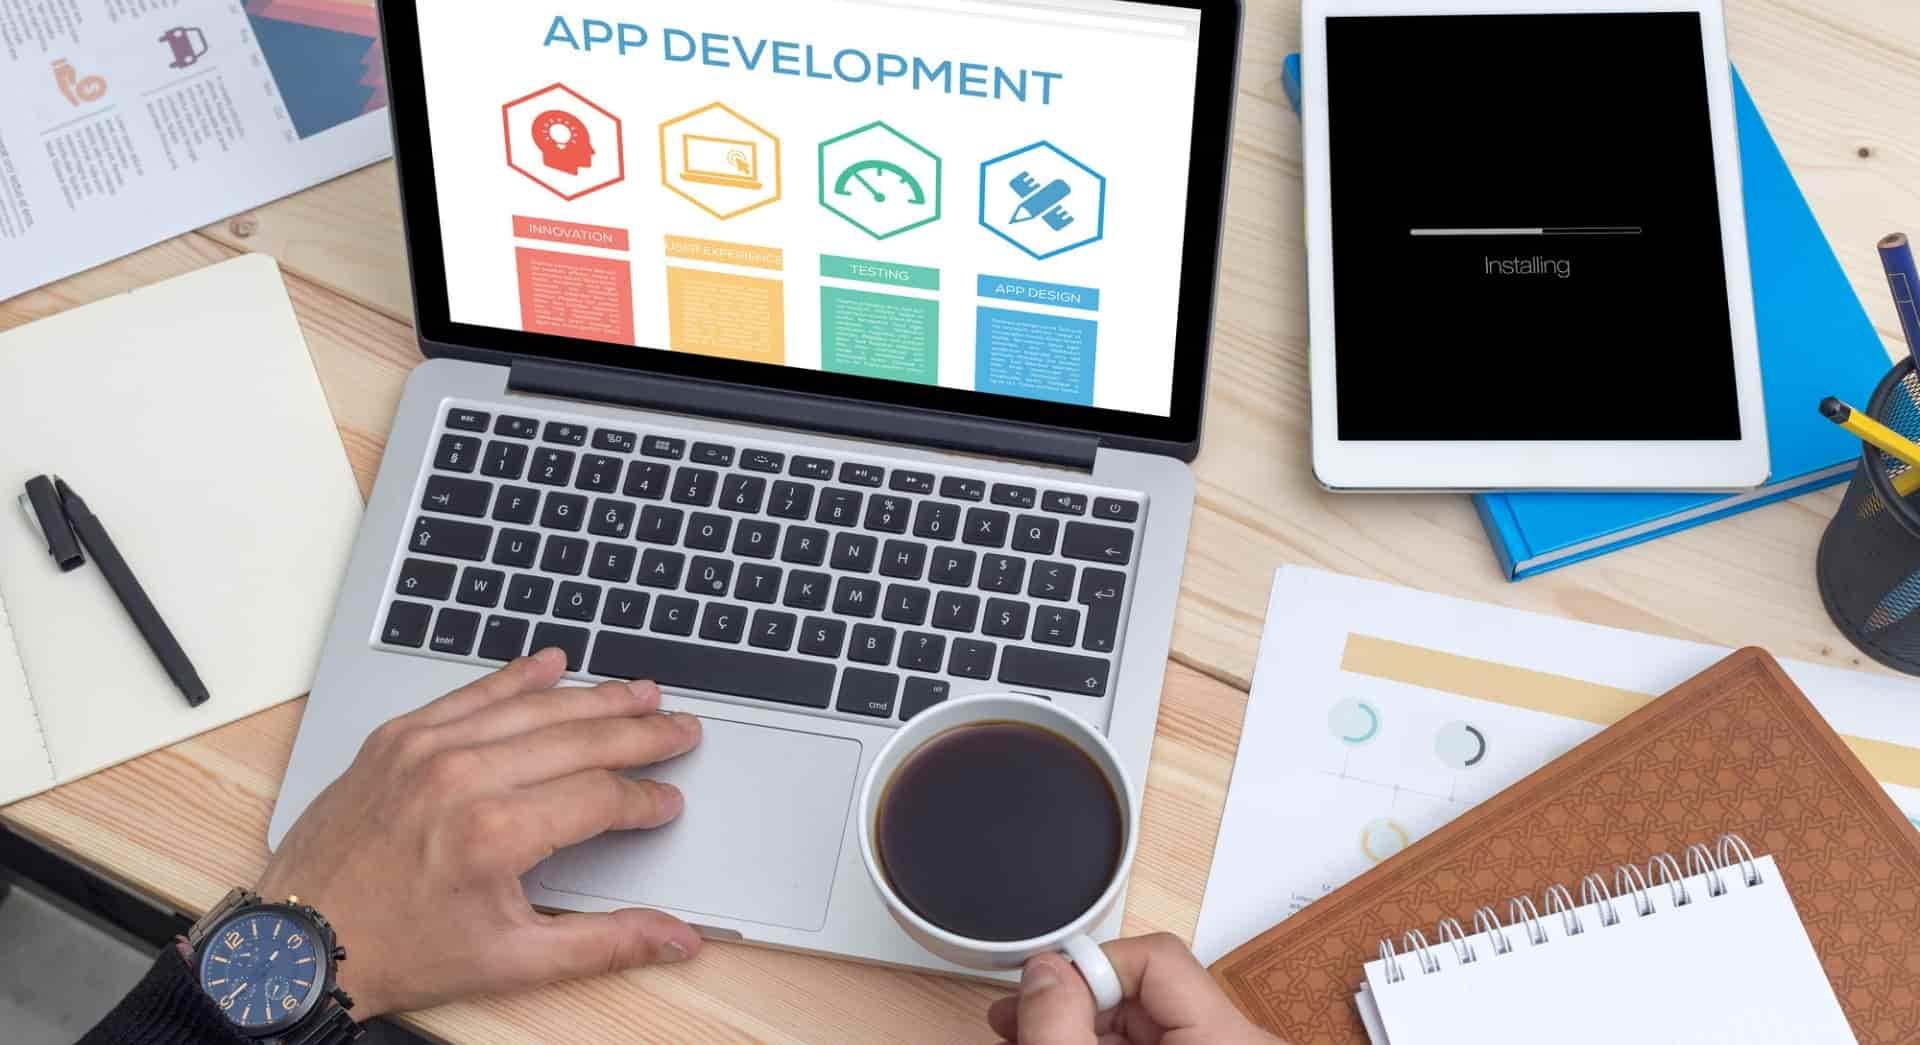 App Development Risks - Startup Creator